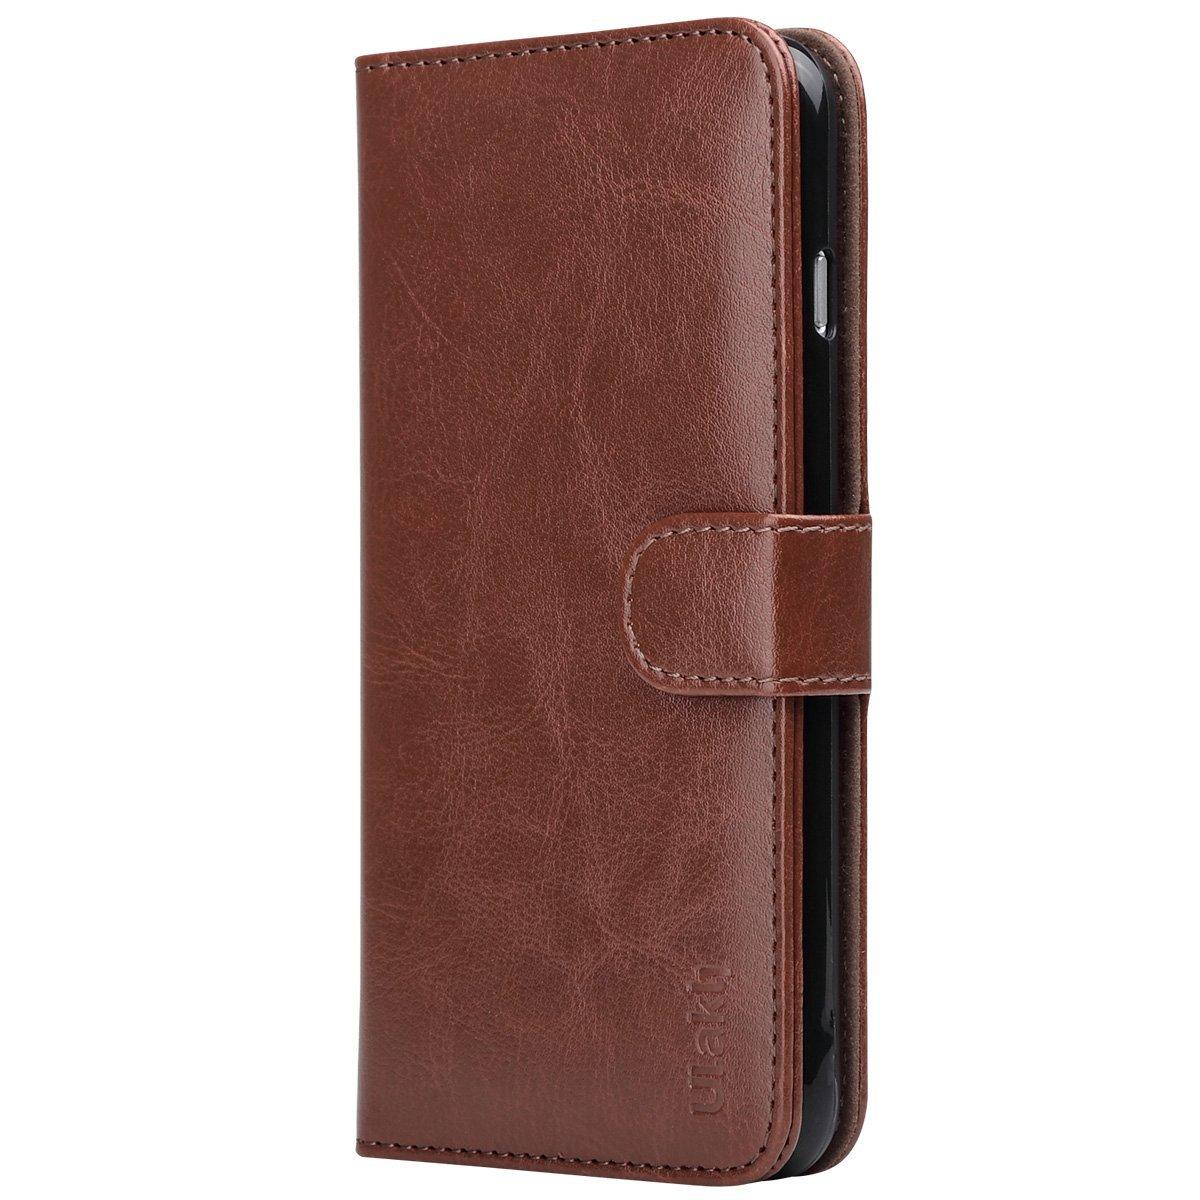 befded5dd8154f Buy iPhone 6 Plus Case